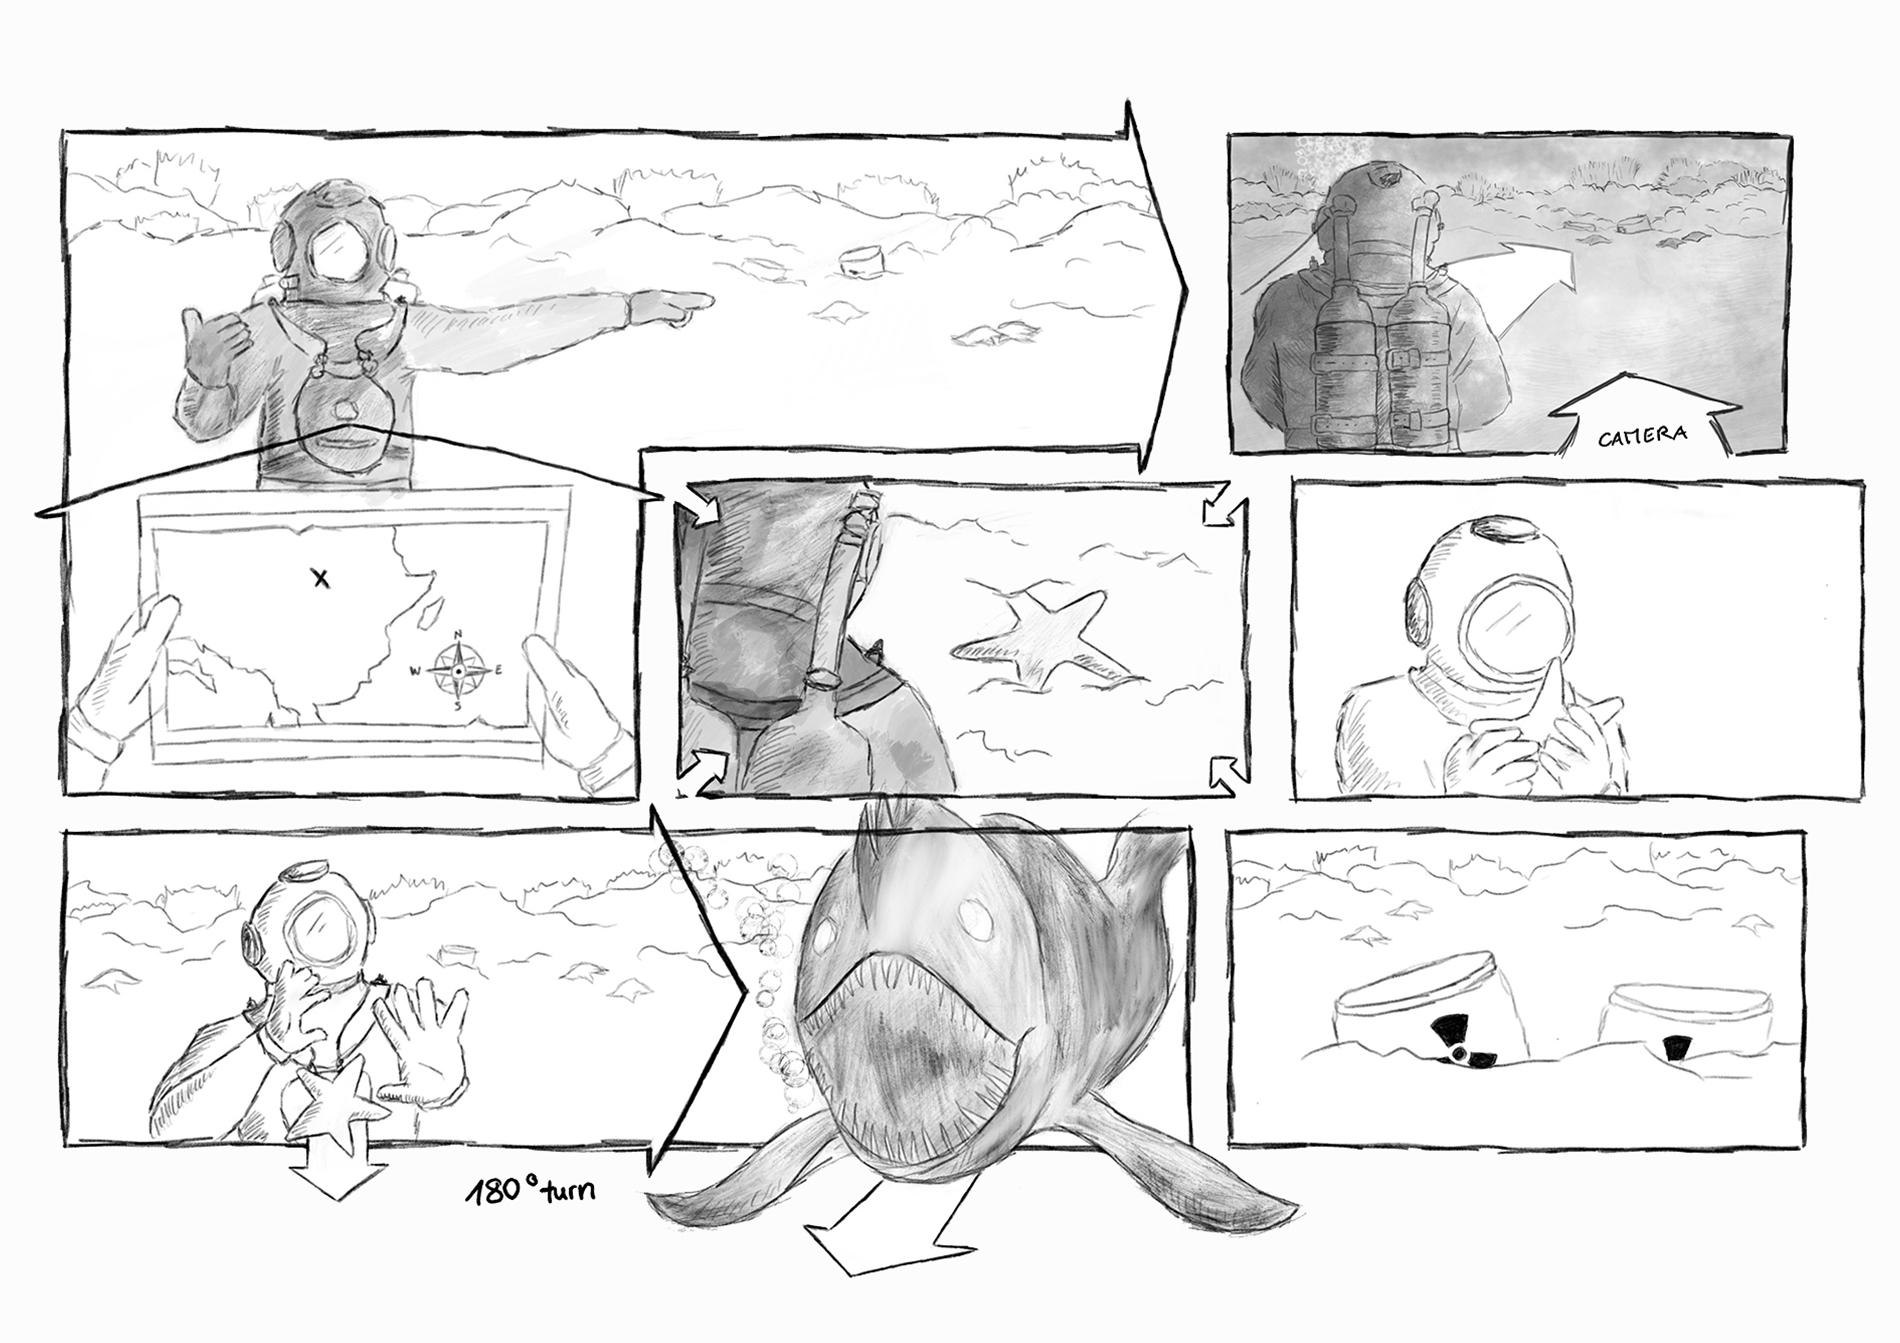 Storyboard Fortschritt 1: Schwarzweiss-Skizze